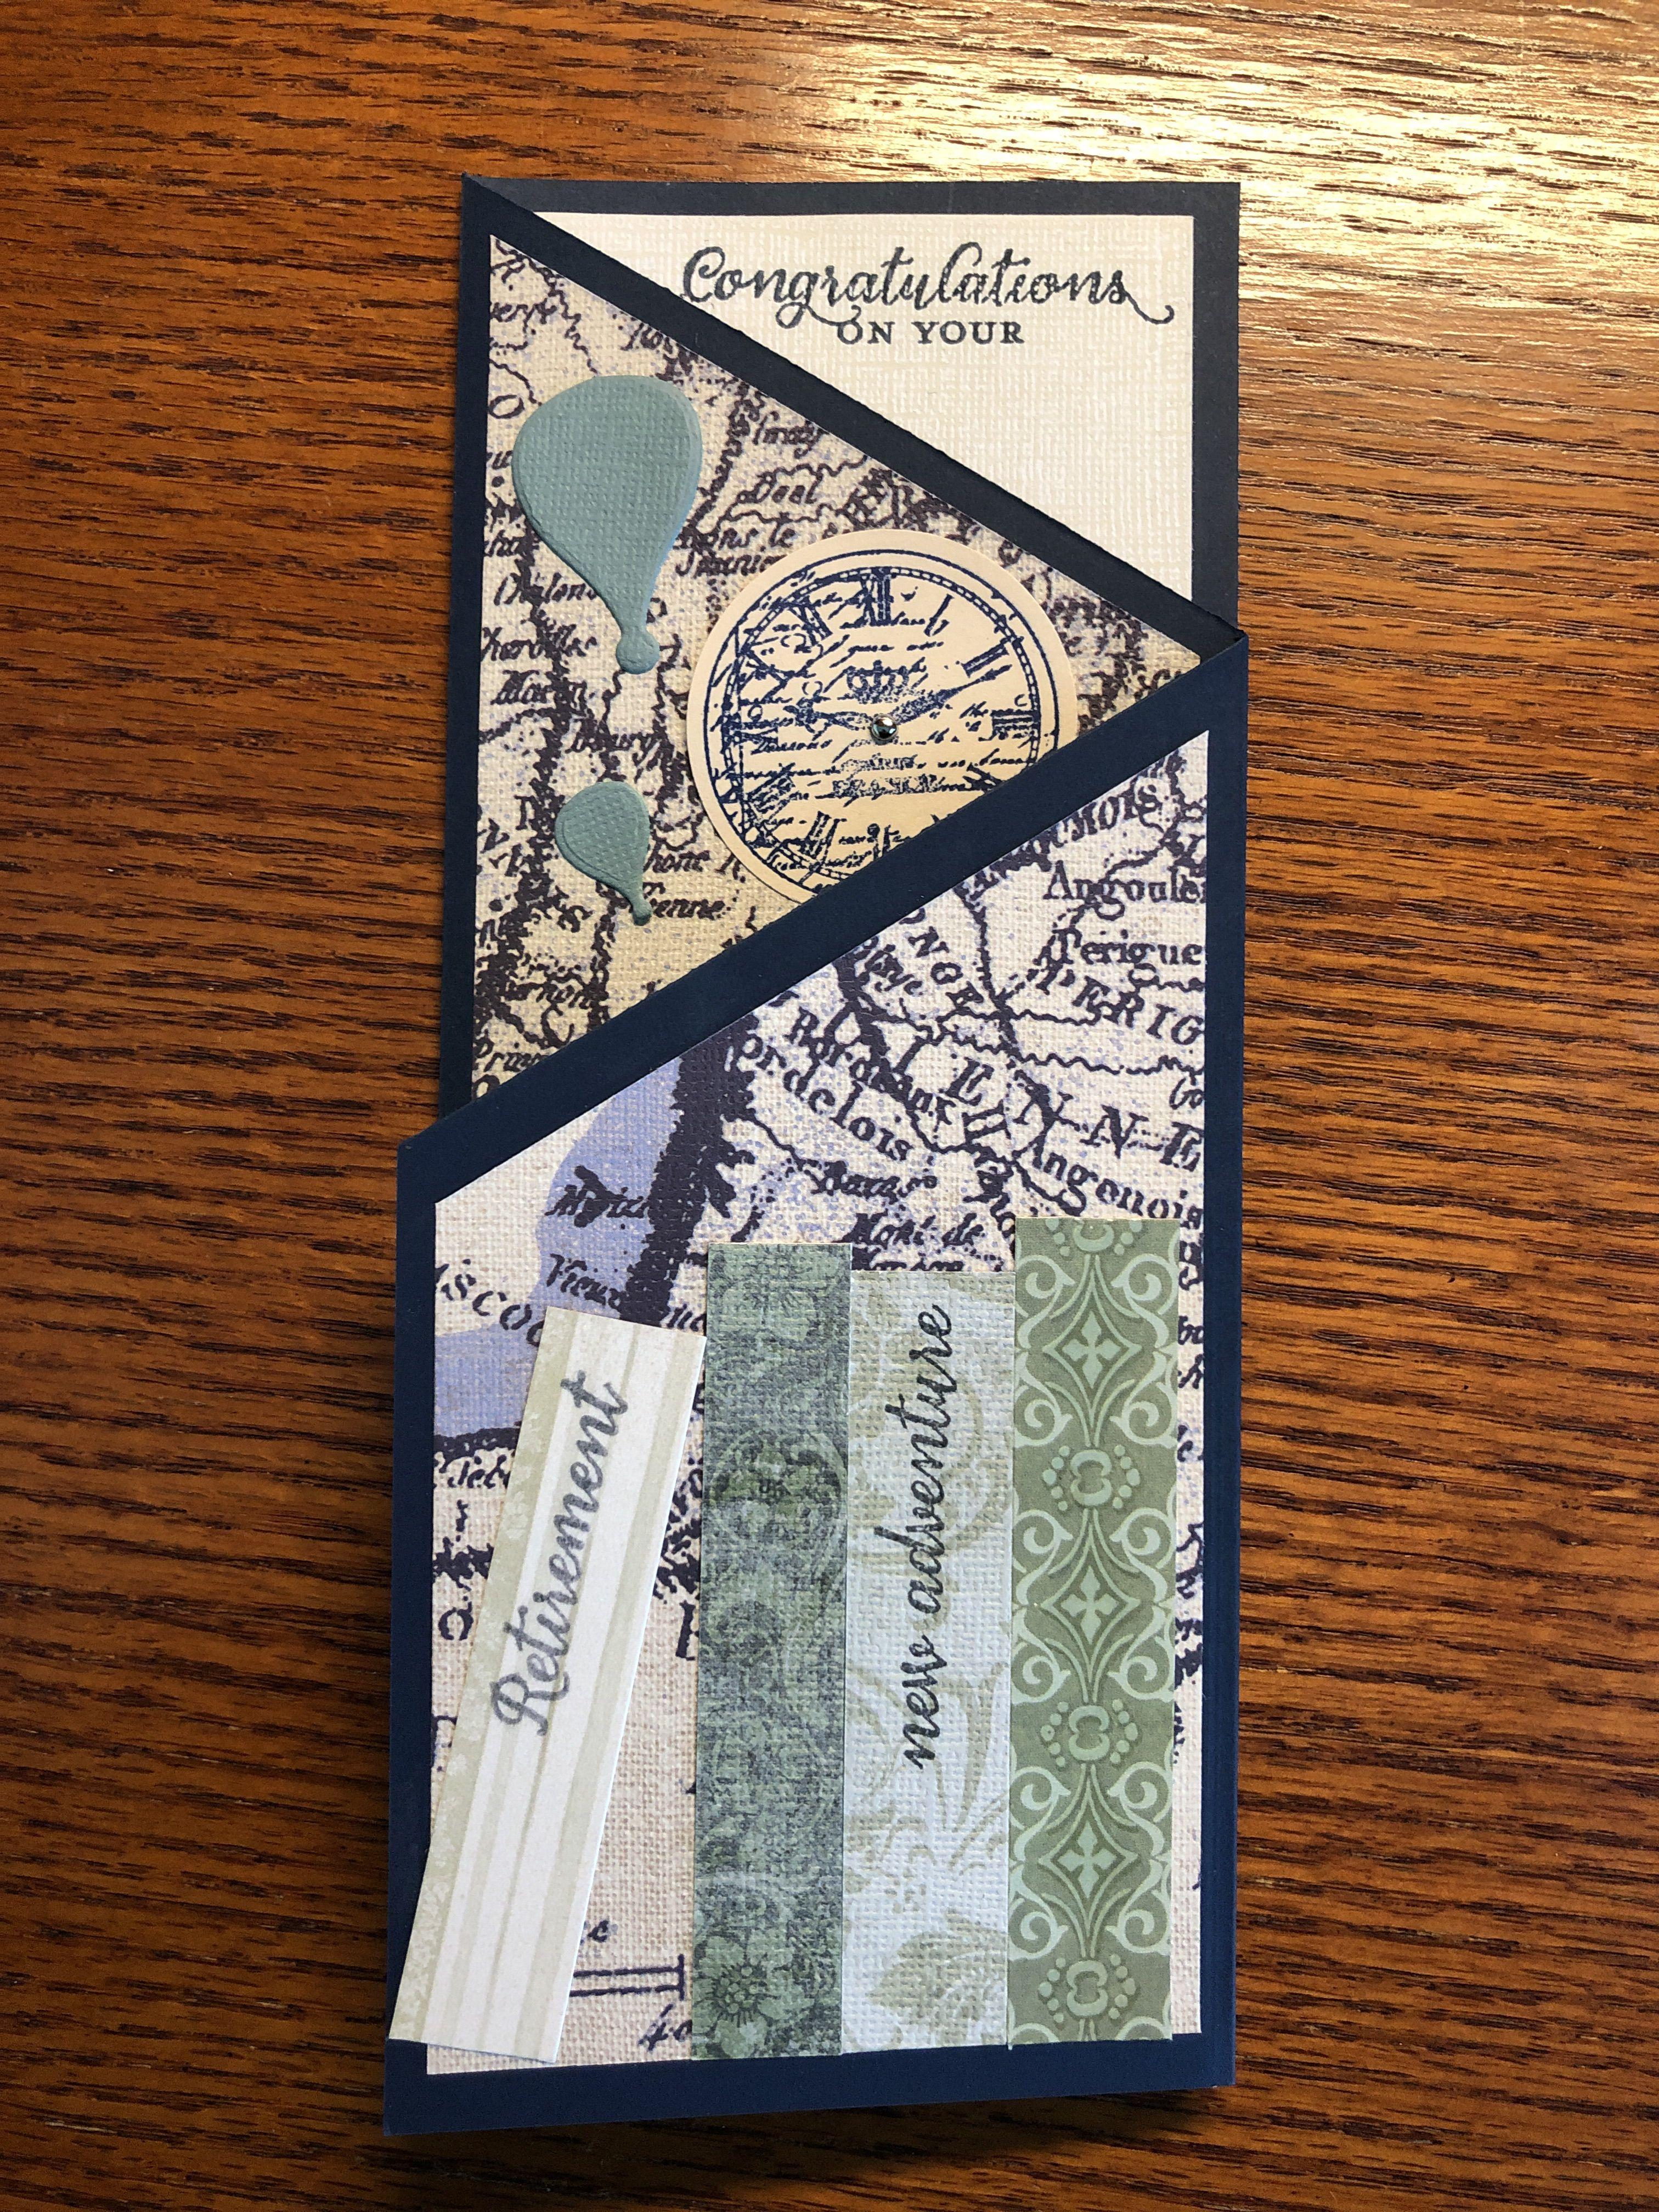 Luxury Handmade Retirement Card - Handmade Cards -Pink & Posh |Handmade Retirement Cards